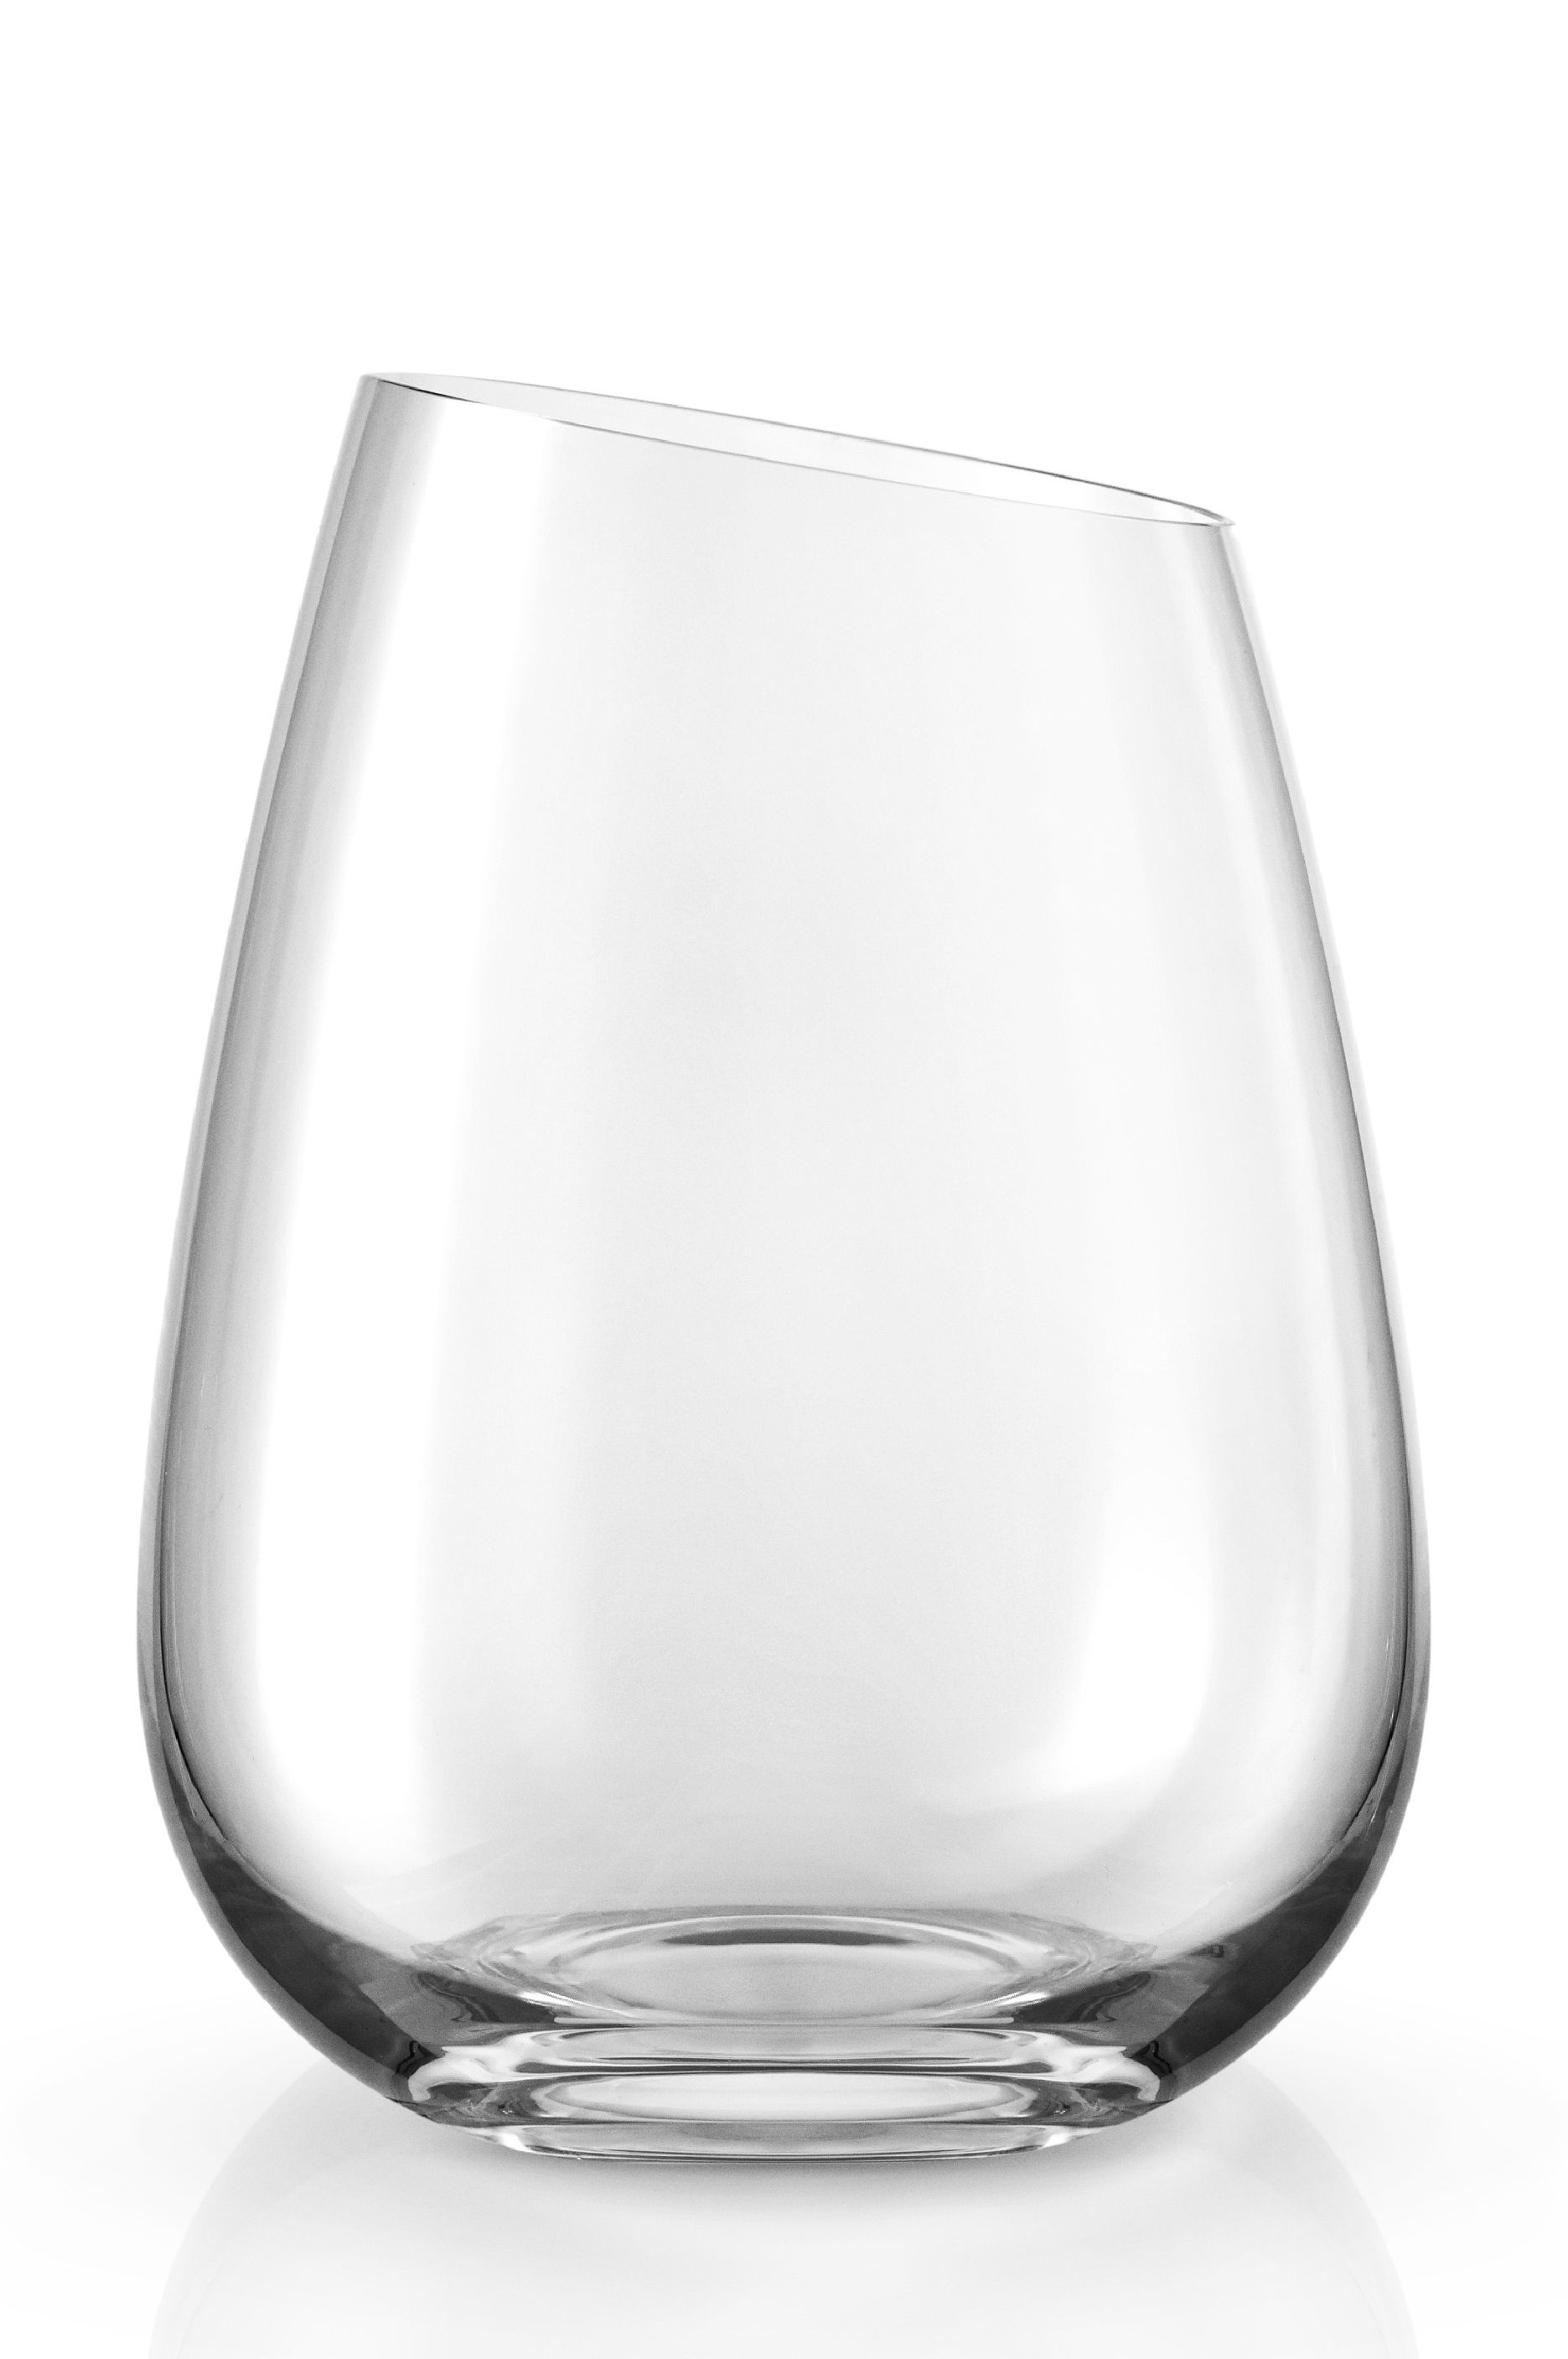 verre eau small 38 cl small 38 cl eva solo made in design. Black Bedroom Furniture Sets. Home Design Ideas